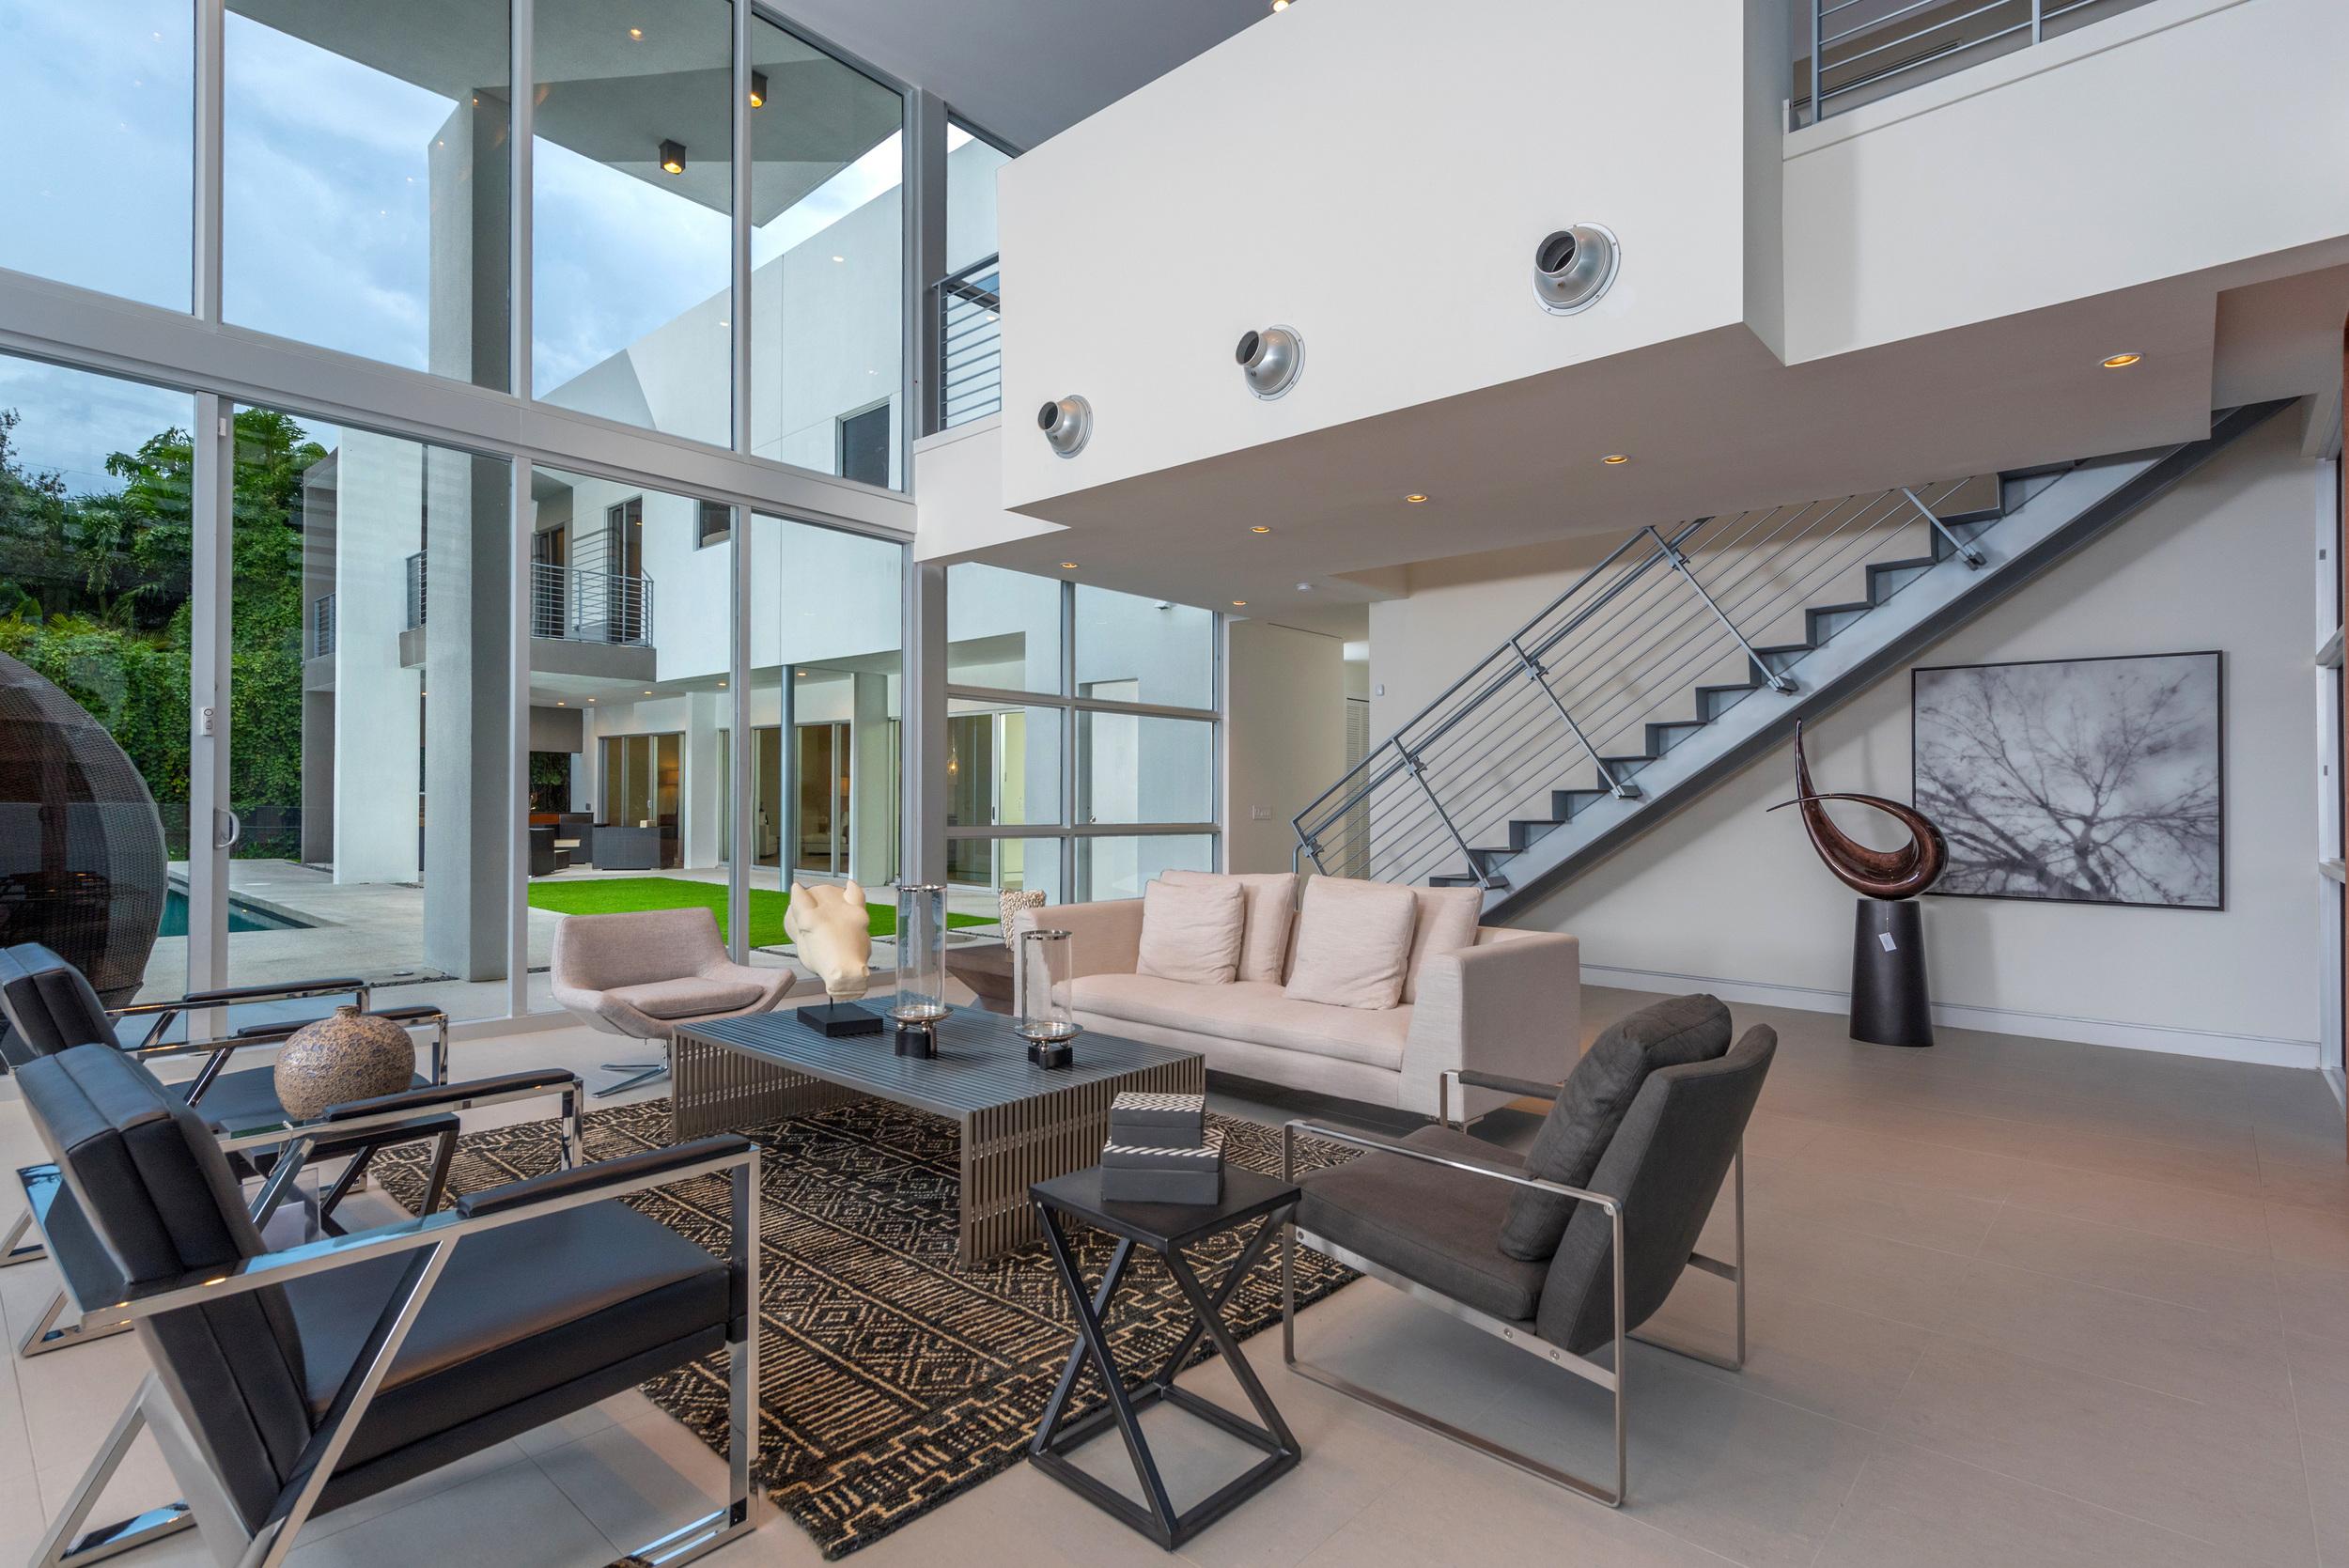 The Setting Homes Plum House Miami Florida Interior Living Room Dusk TARIS Real Estate